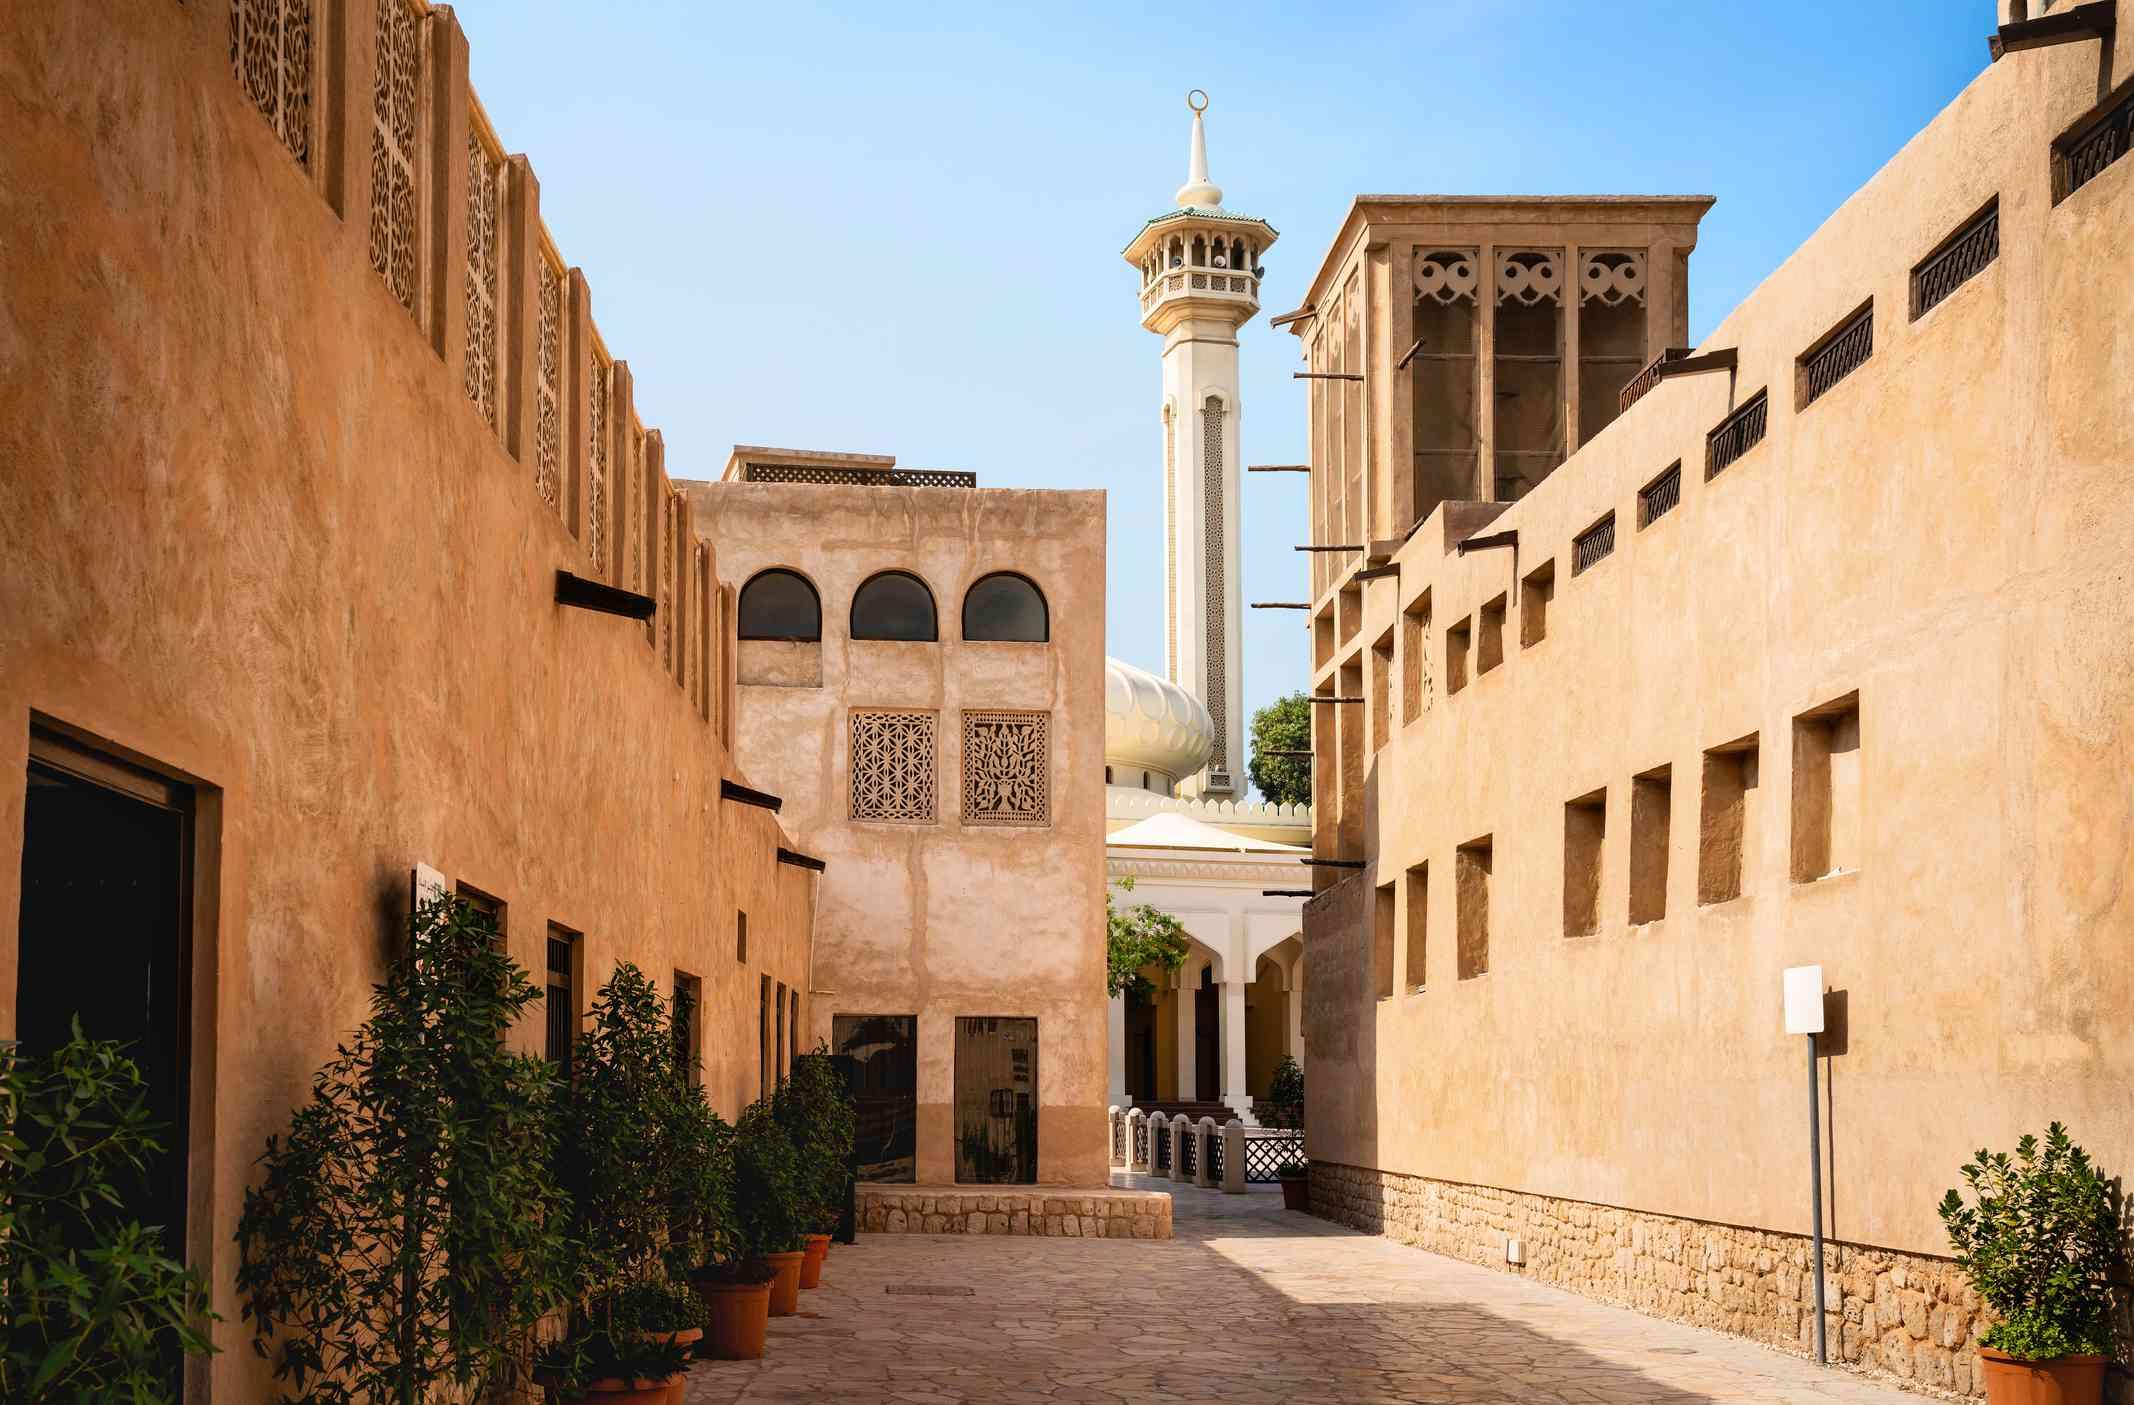 Old Dubai view with mosque, buildings and traditional Arabian street. Historical Al Fahidi neighbourhood, Al Bastakiya. Heritage district in United Arab Emirates.